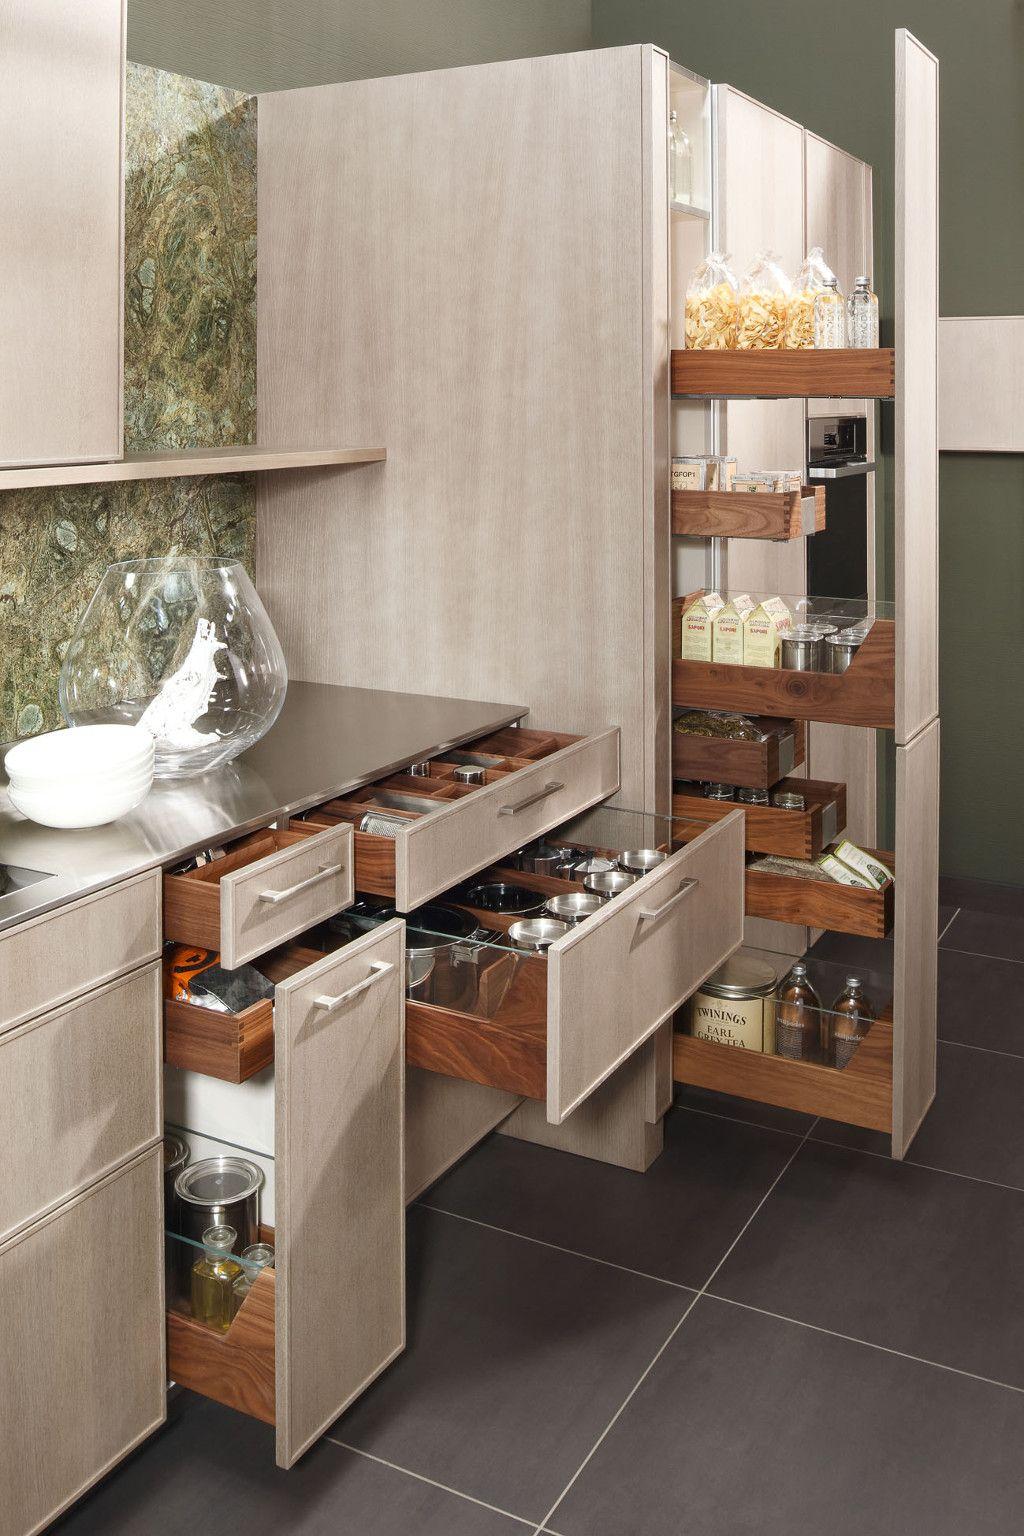 Opbergruimte keuken bron zeyko kleine keuken pinterest kleine keuken keuken en zoeken - Keukenkast outs ...